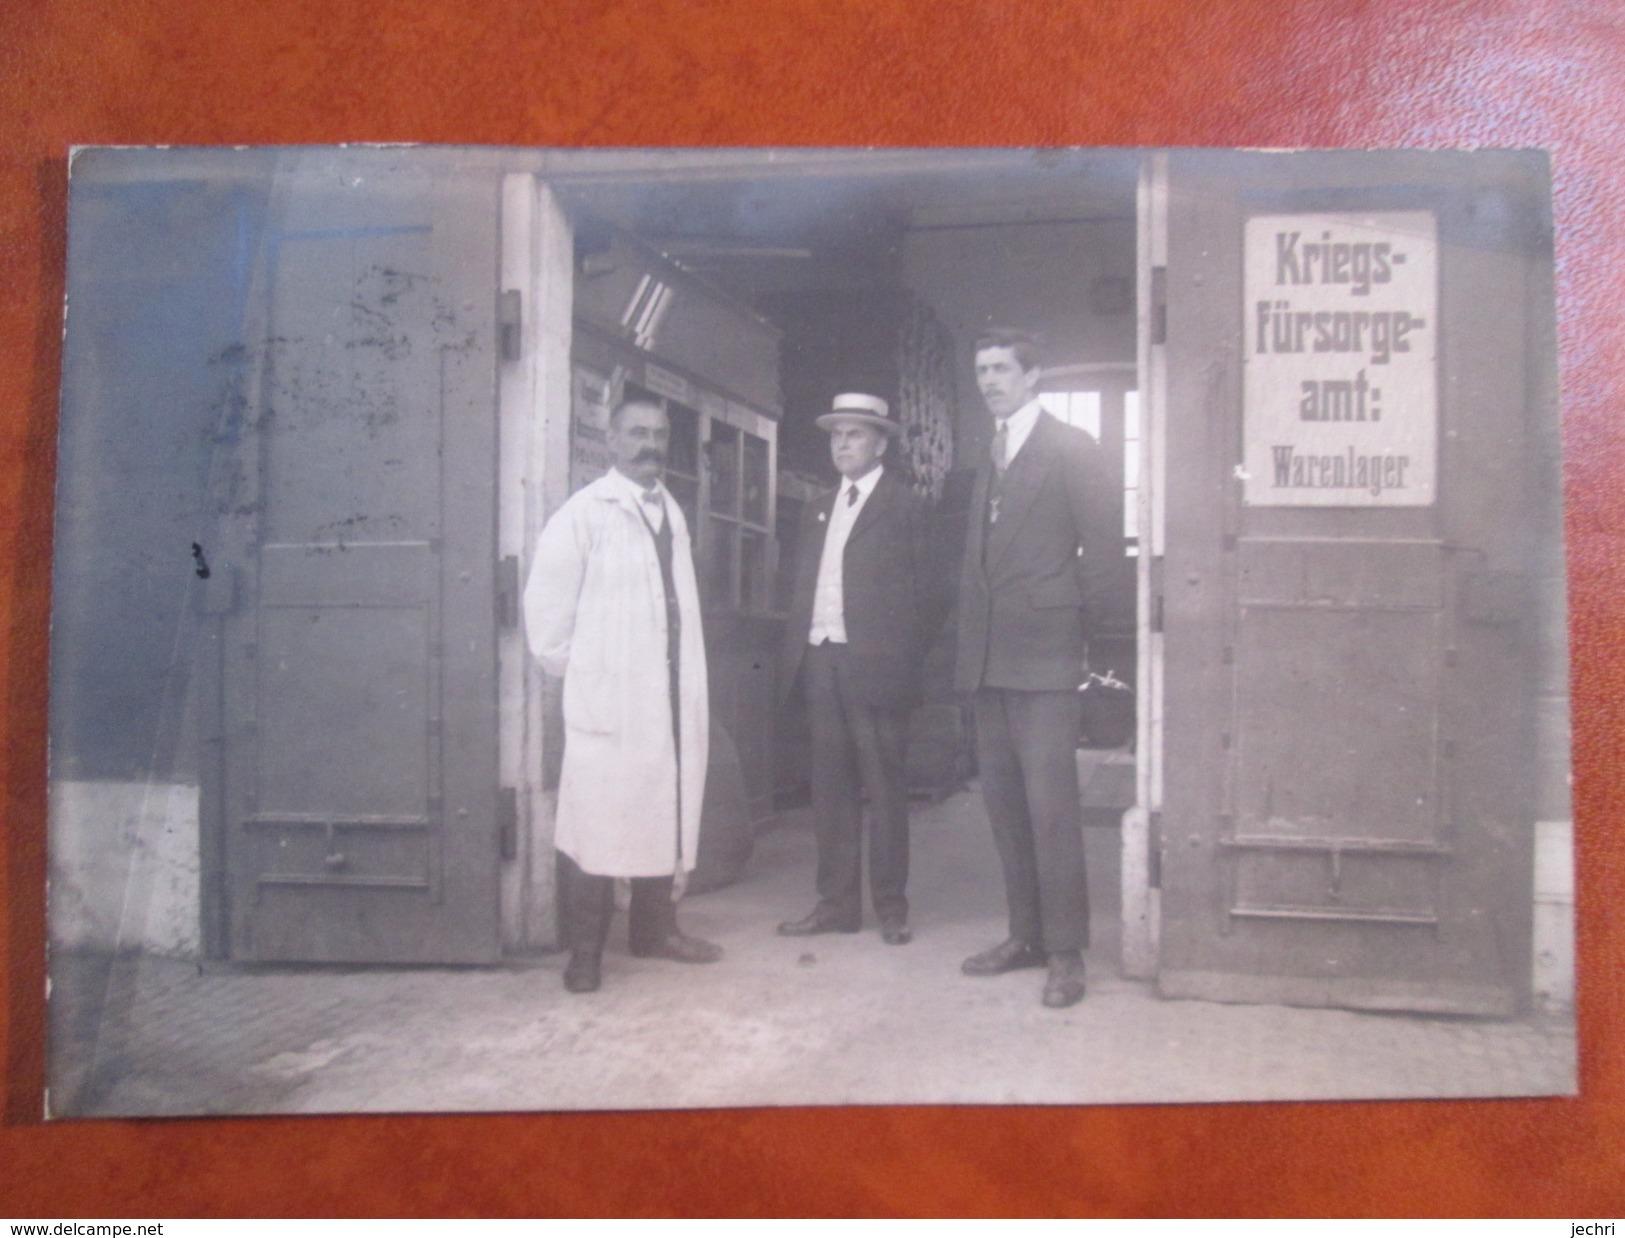 CARTE PHOTO . KRIEGS FURSORGE AMT .WARENLAGER - BS Basle-Town